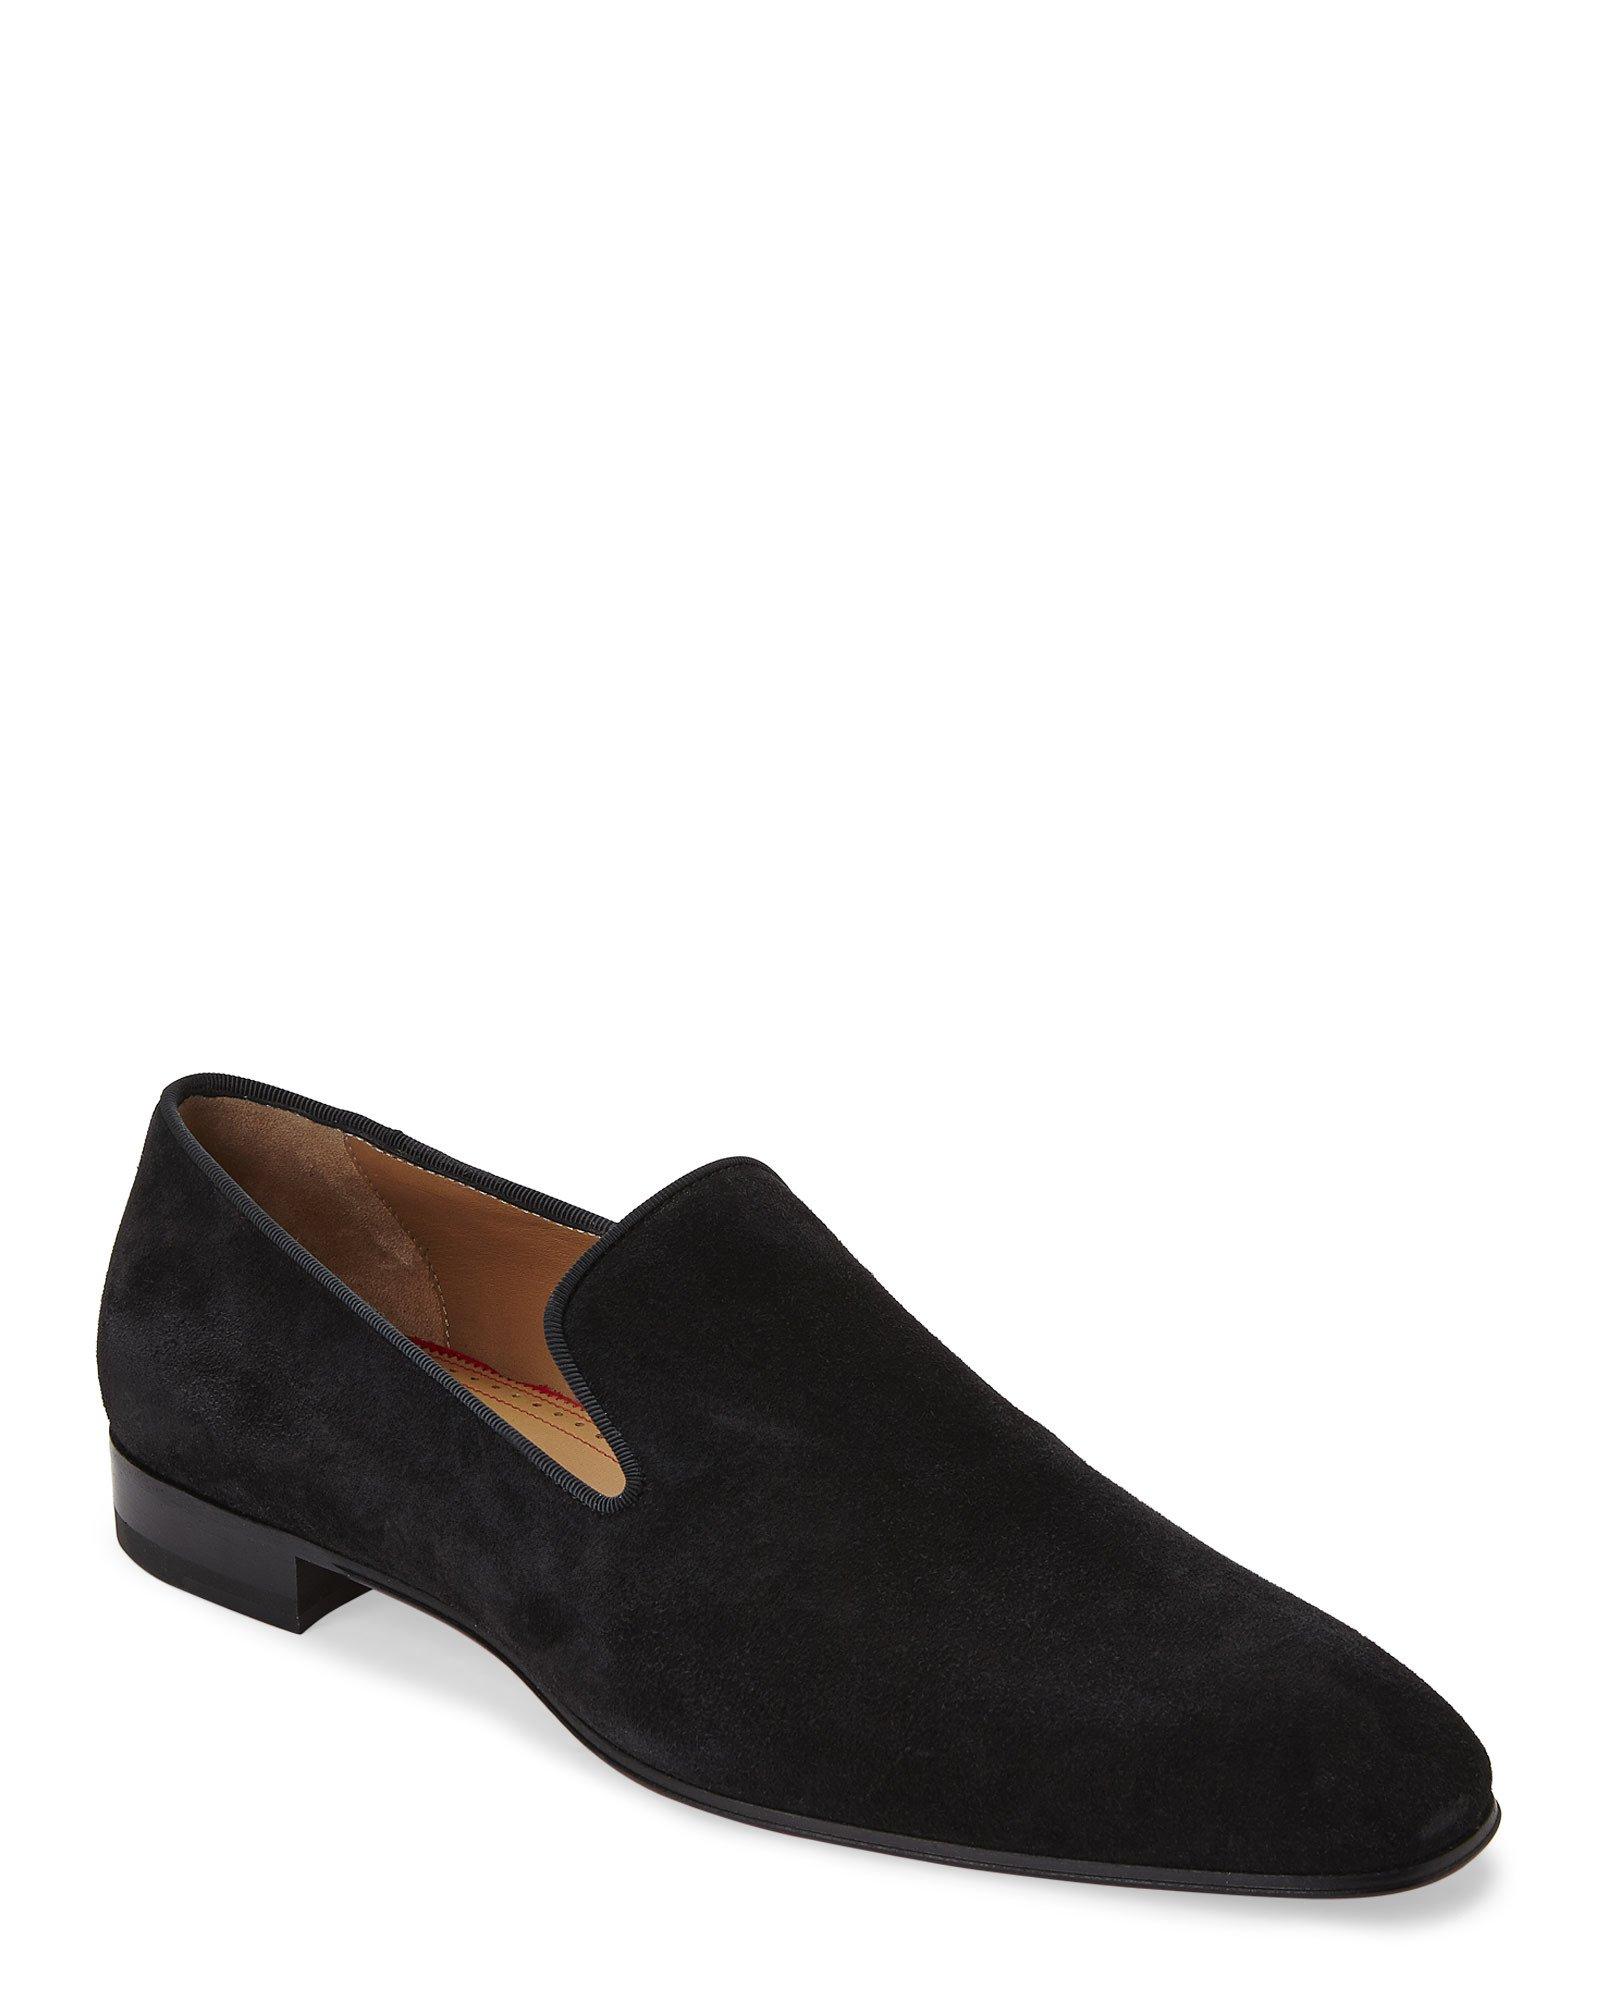 d3bfbb693b5 Lyst - Christian Louboutin Black Dandelion Smoking Loafers in Black ...